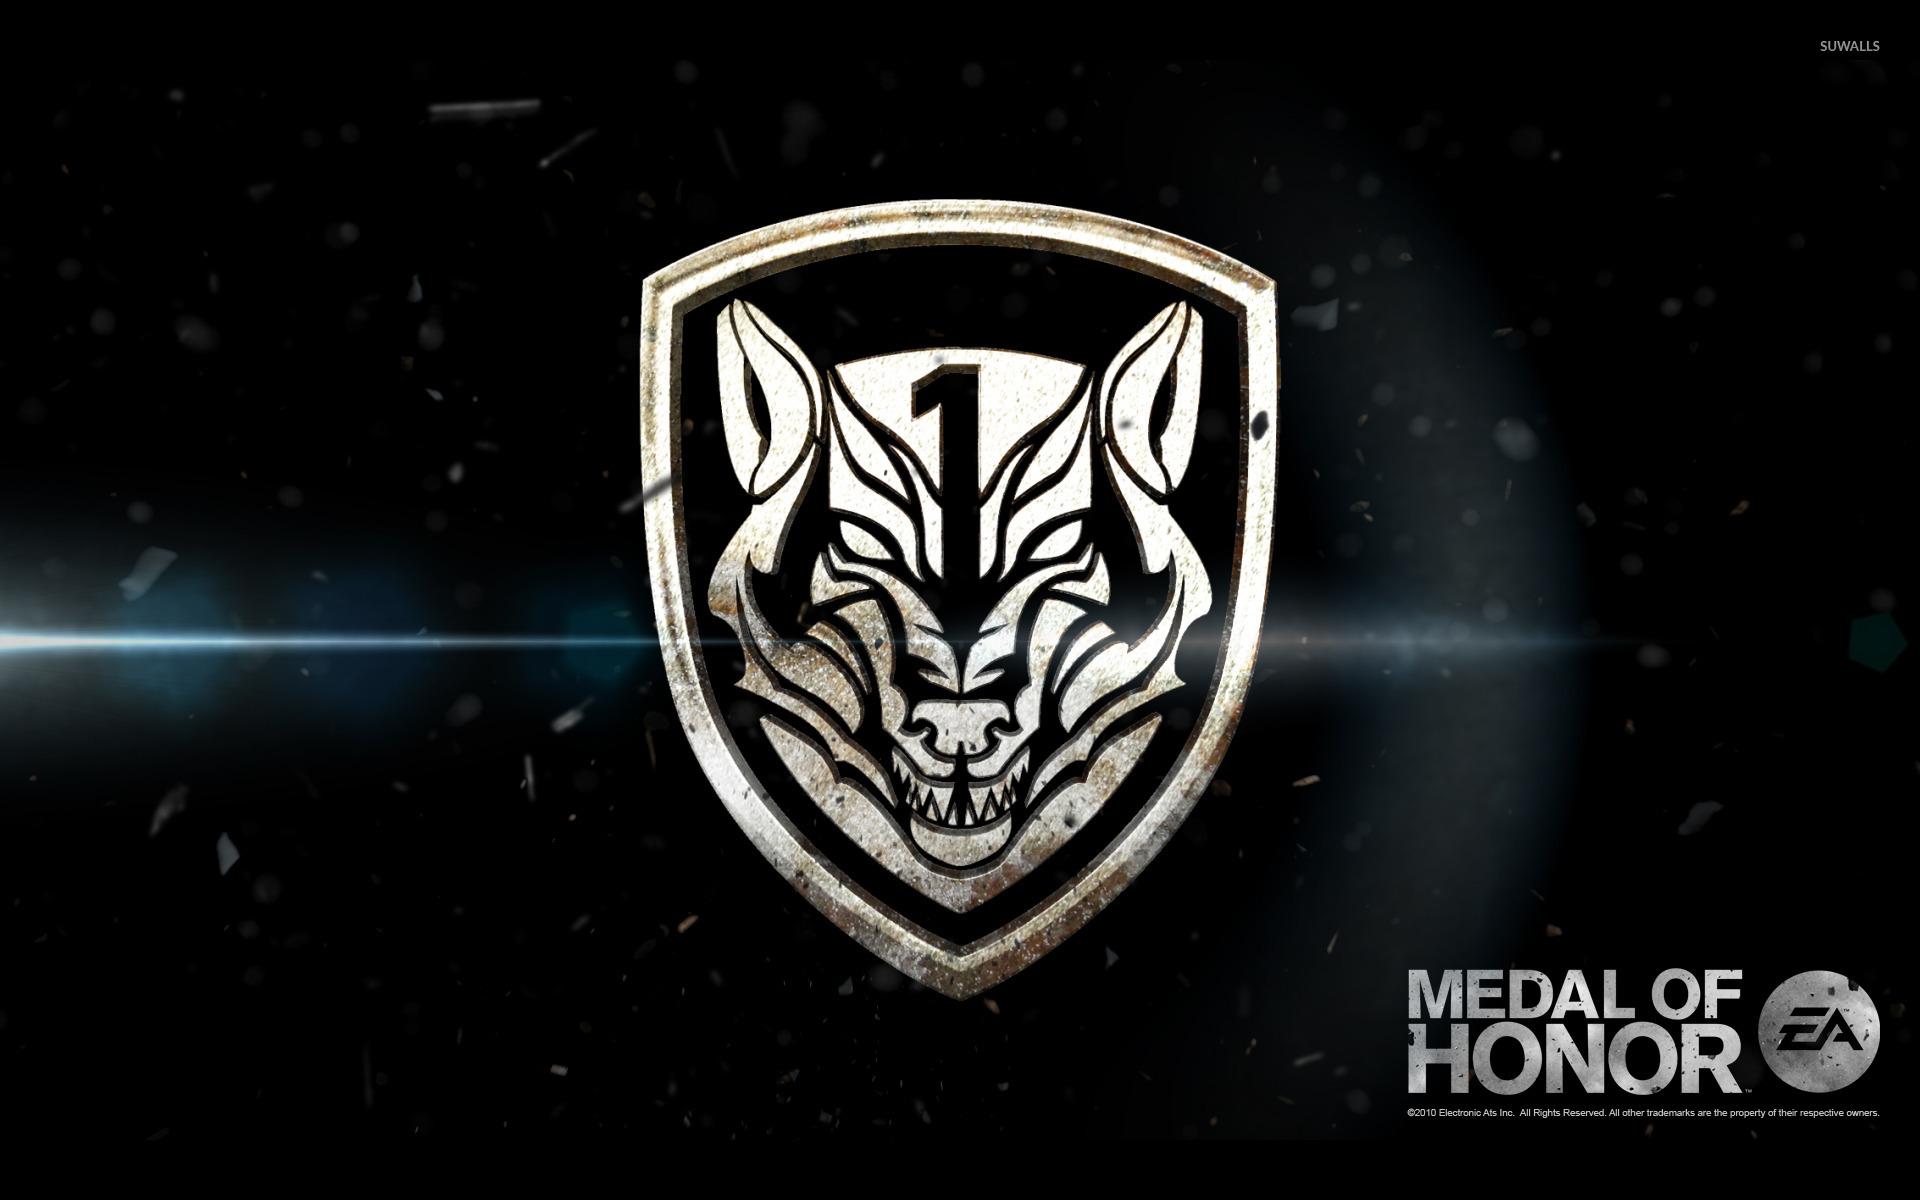 Medal Of Honor 3 Wallpaper Game Wallpapers 9814